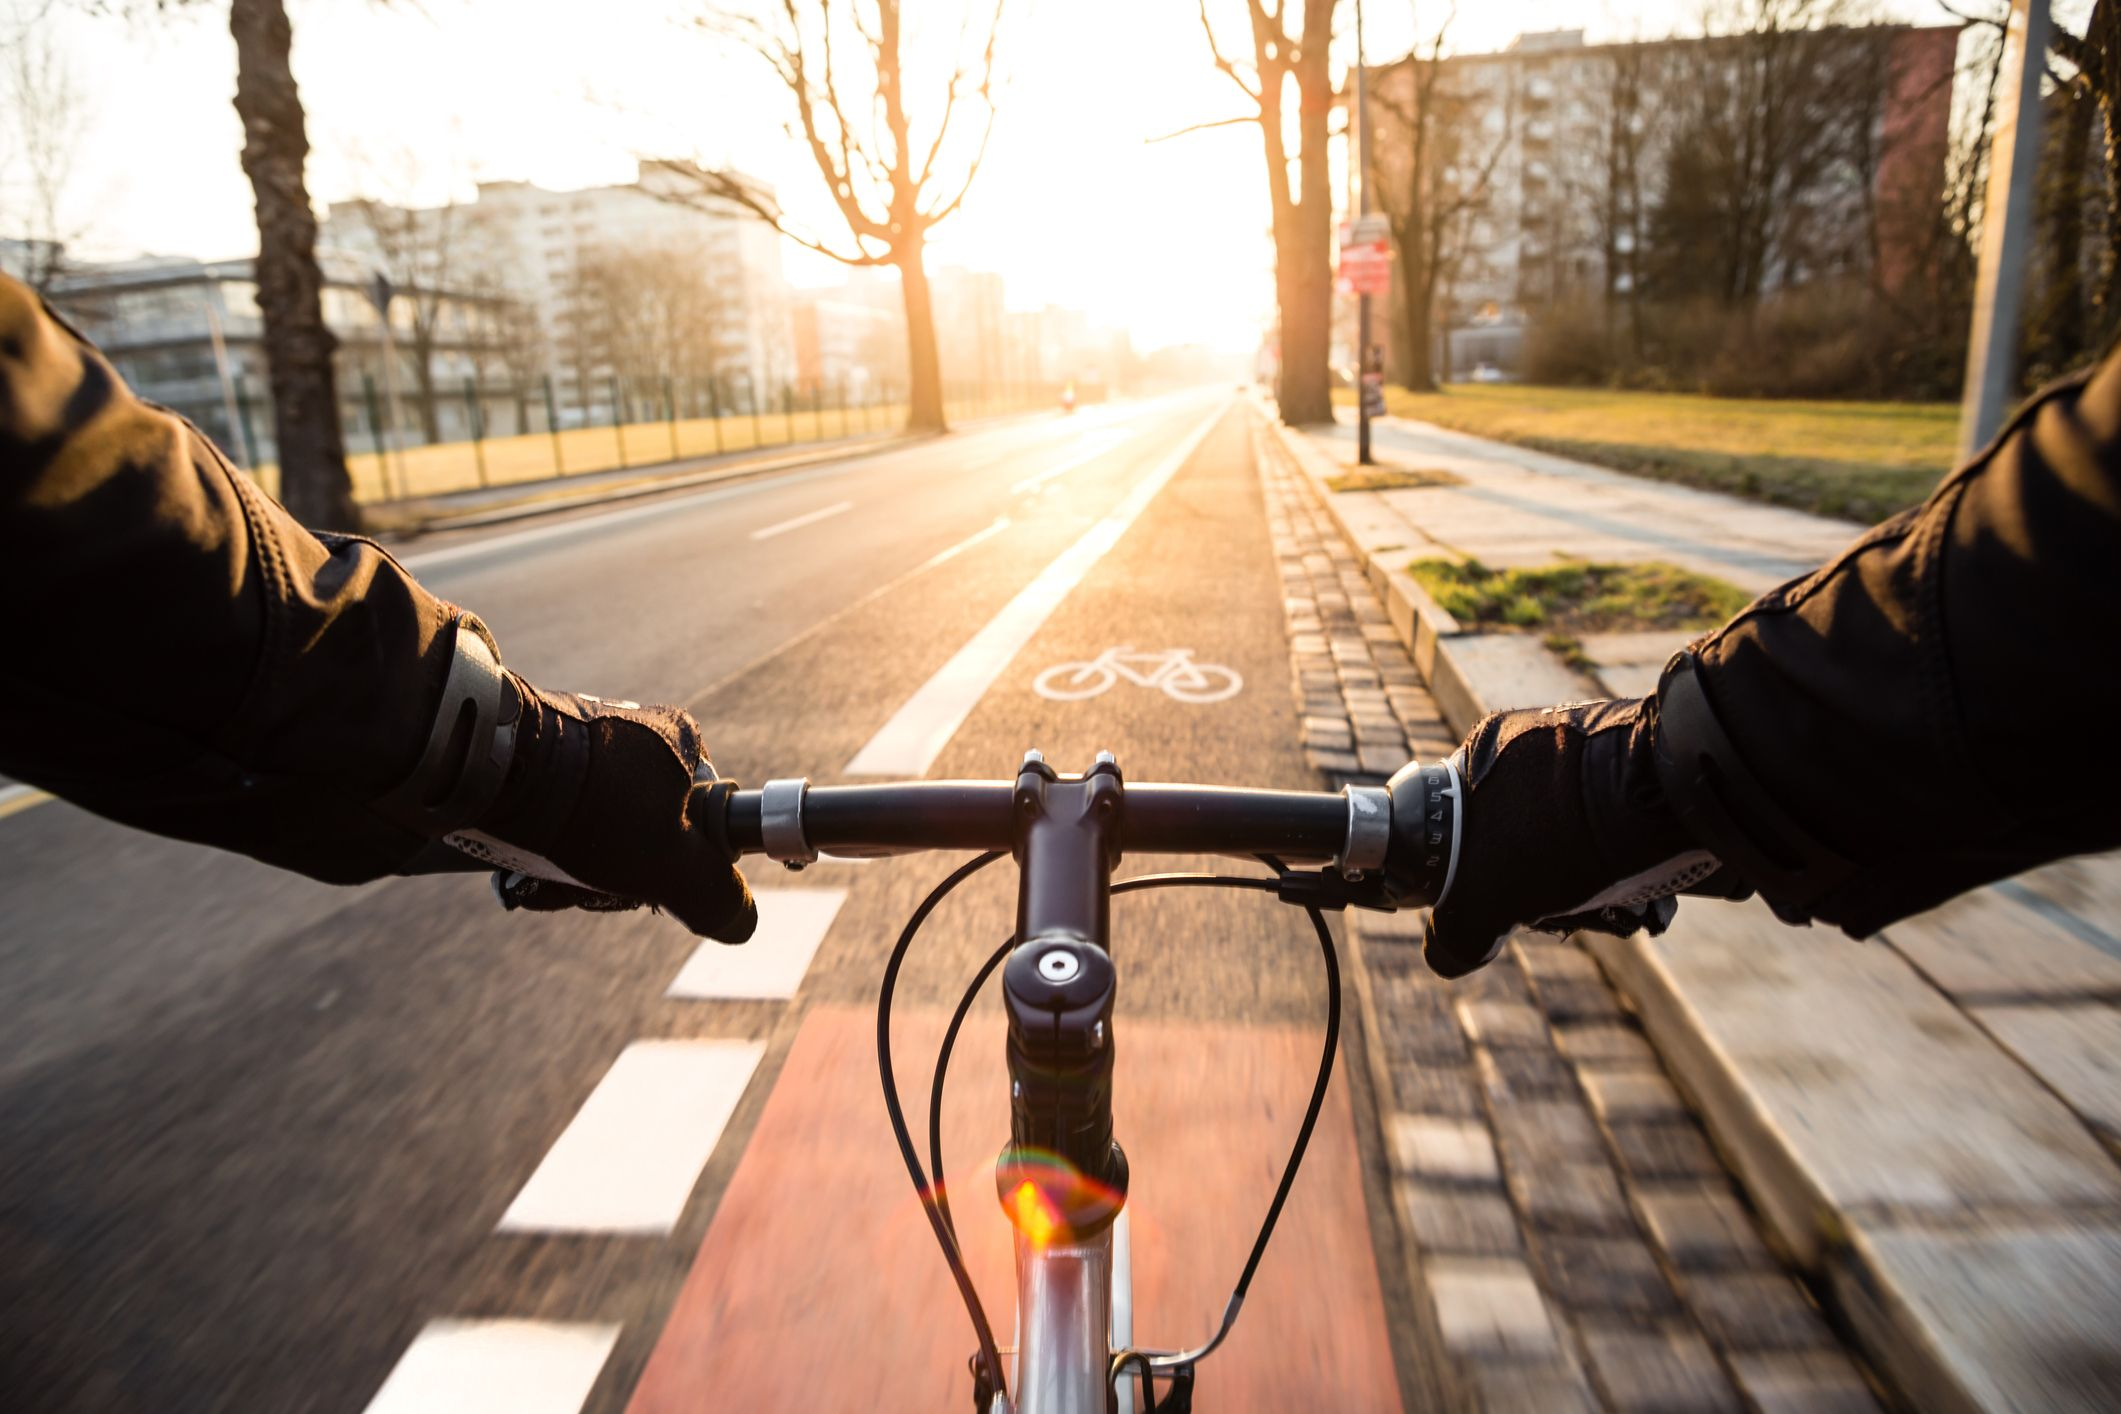 dbdd5bae5 Bike to Work Tips - How to Perfect Your Bike Commute